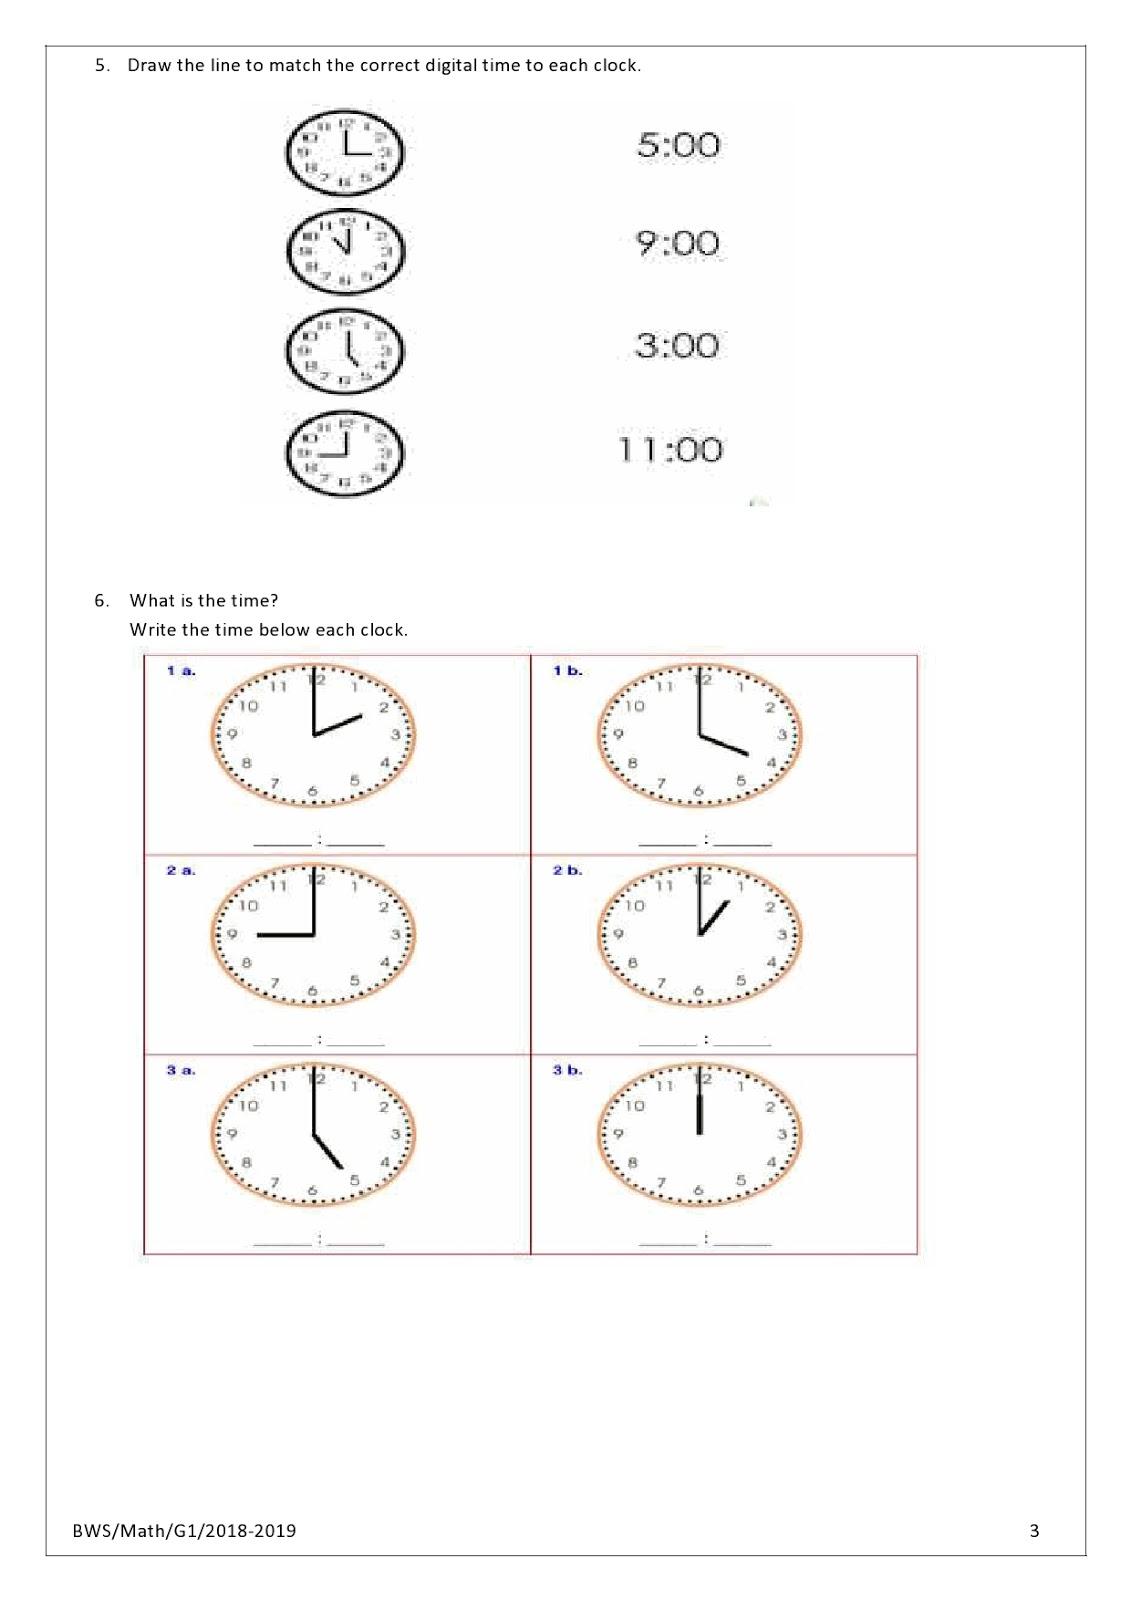 Birla World School Oman Homework For Grade 1 As On 30 04